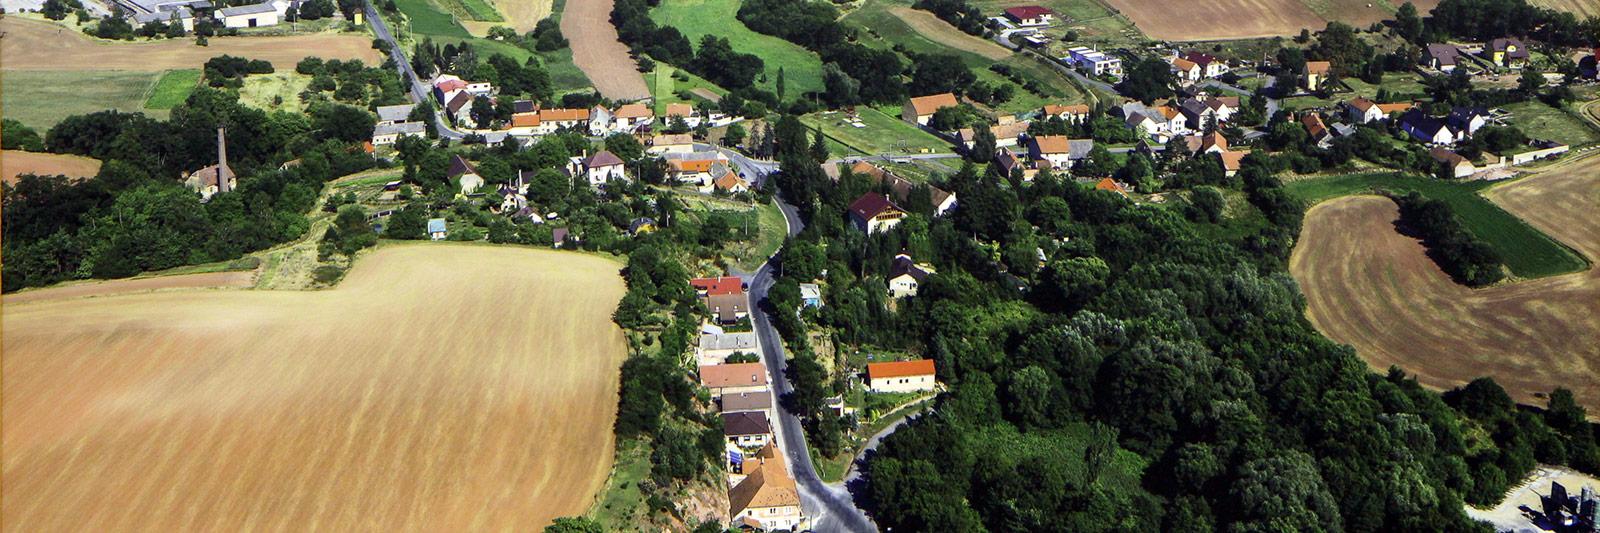 Návrh rozpočtu na rok 2018 - obce Kutrovice